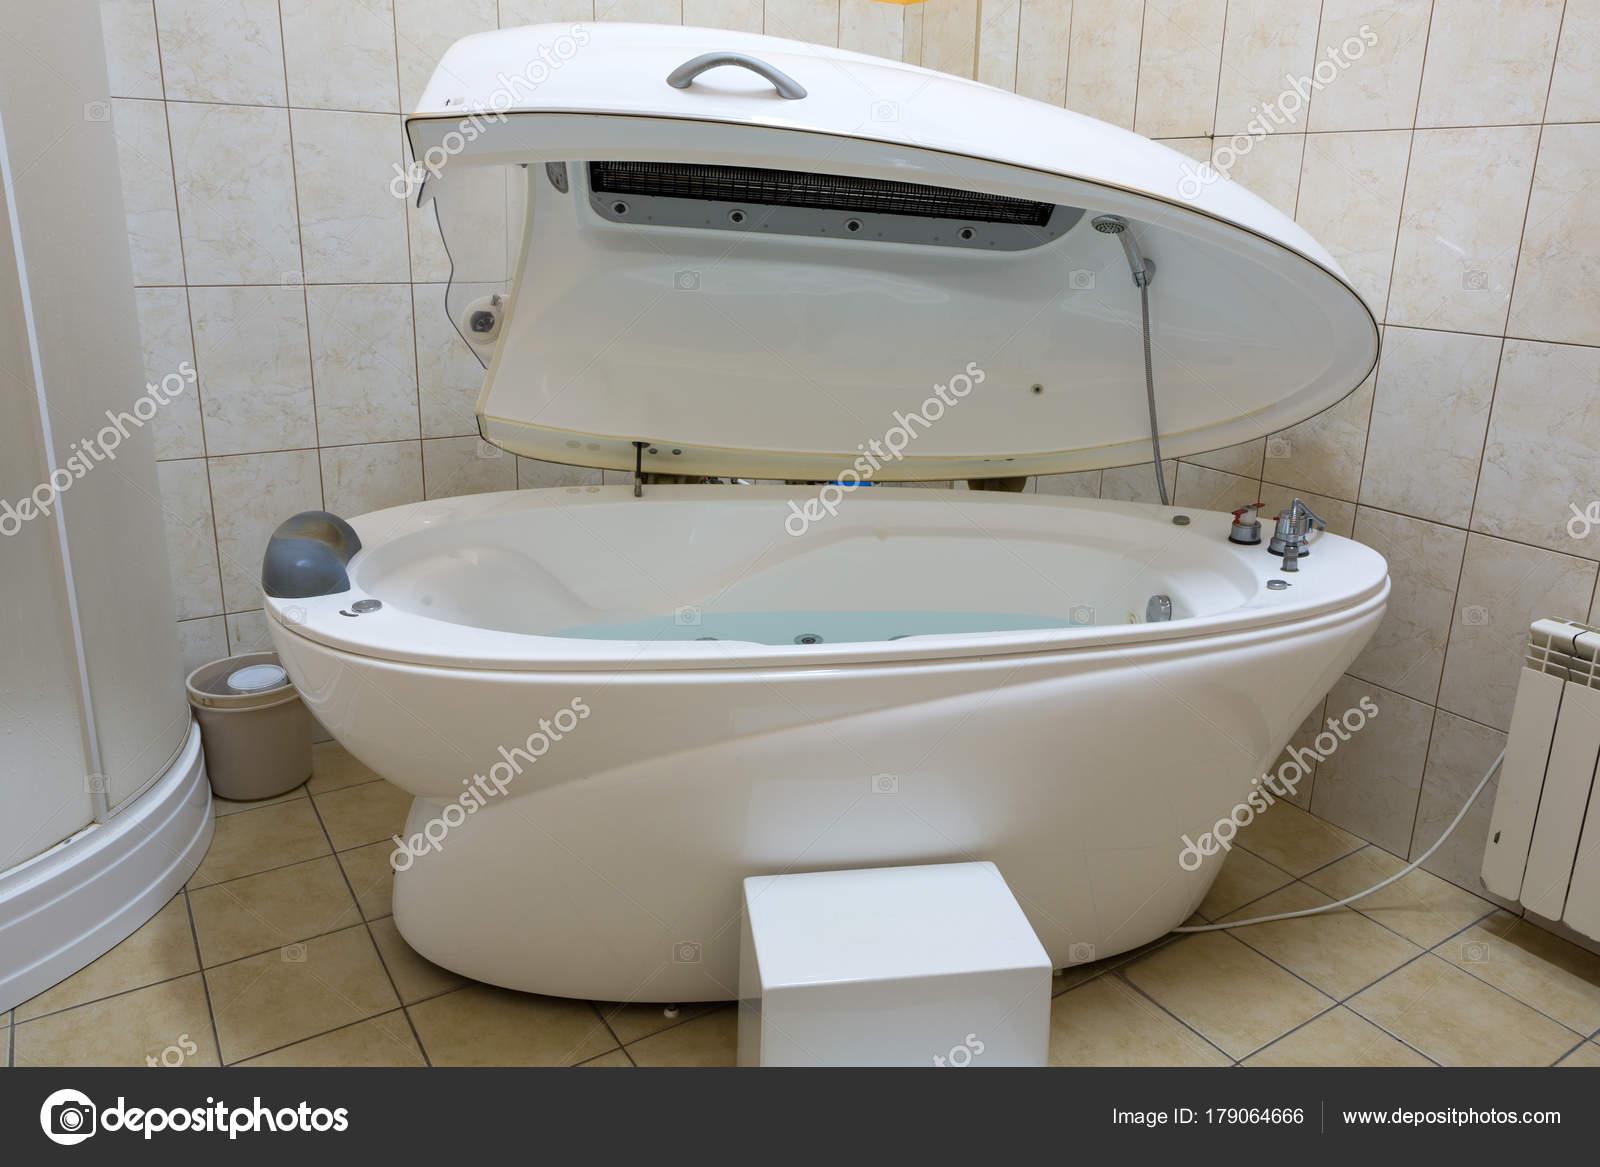 Hydromassage Bathtub Cosmetological Clinic Spa Capsule — Stock Photo ...